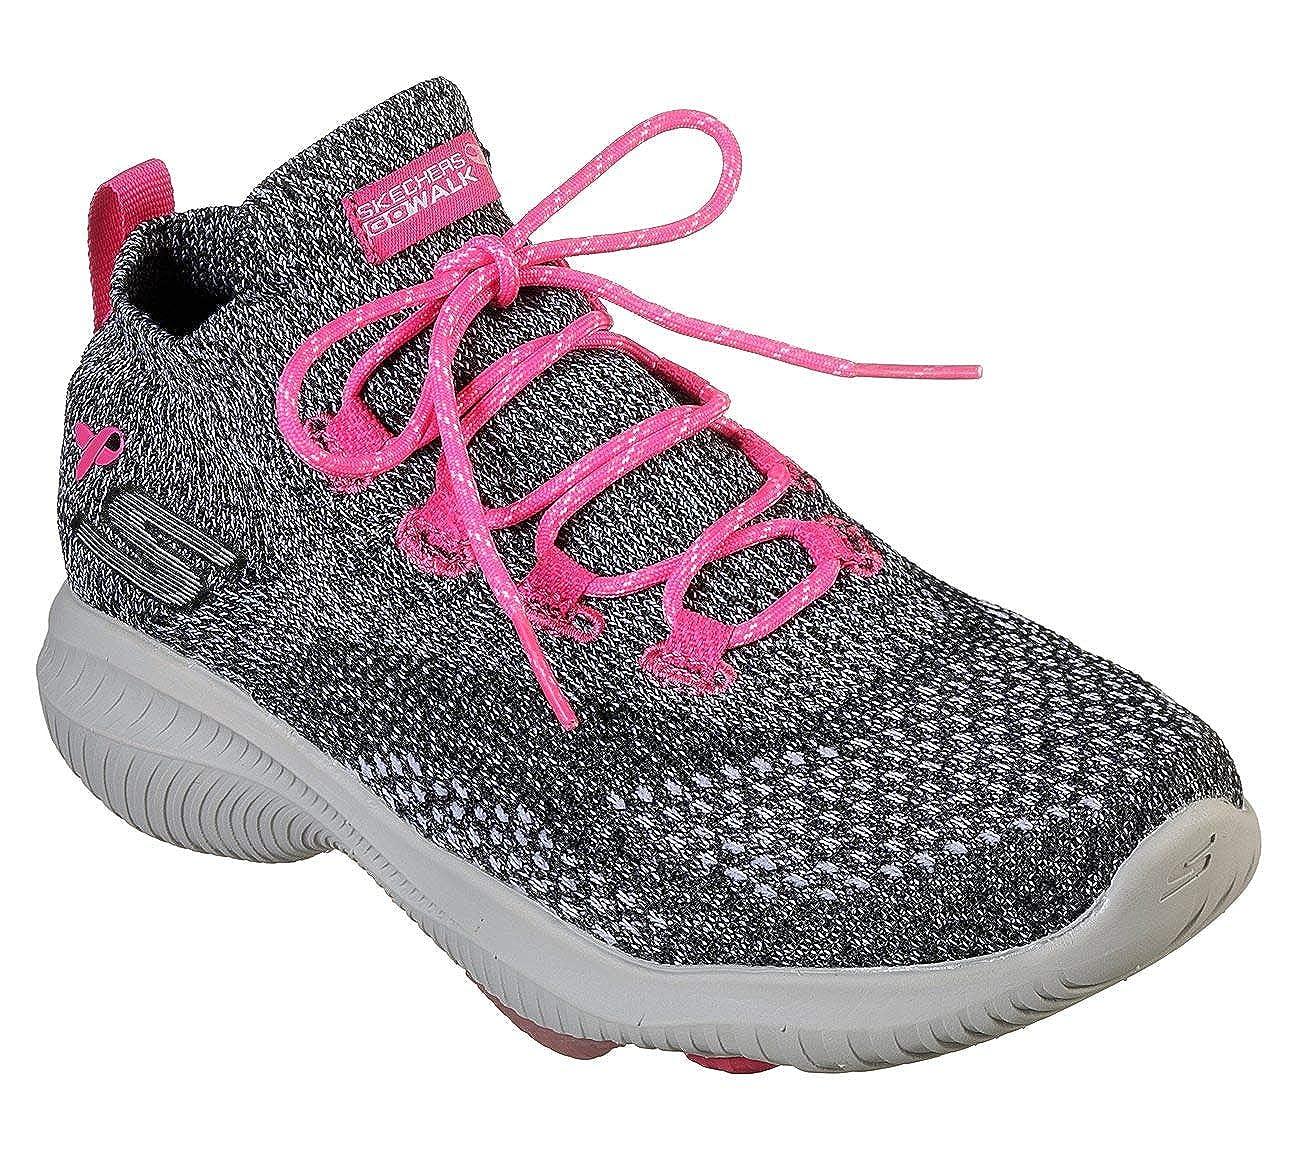 - Skechers Womens's Go Walk Revolución Ultra, Walking, Black Pink, US M